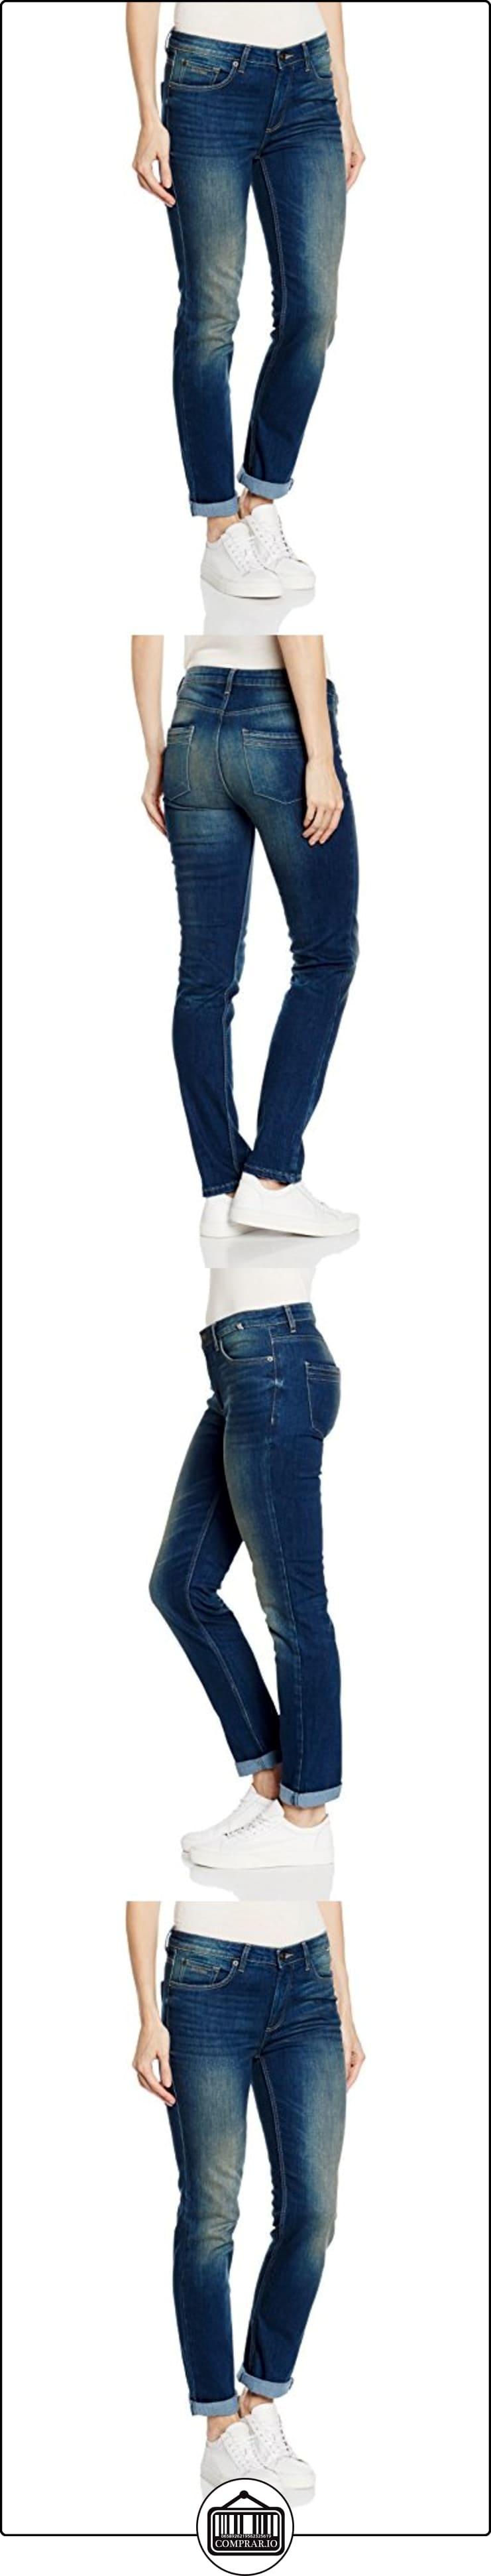 H.I.S Jeans Marylin, Jeans para Mujer, Azul (Prime Blue 9363), W27/L33 (Talla del Fabricante: 36/33)  ✿ Vaqueros ✿